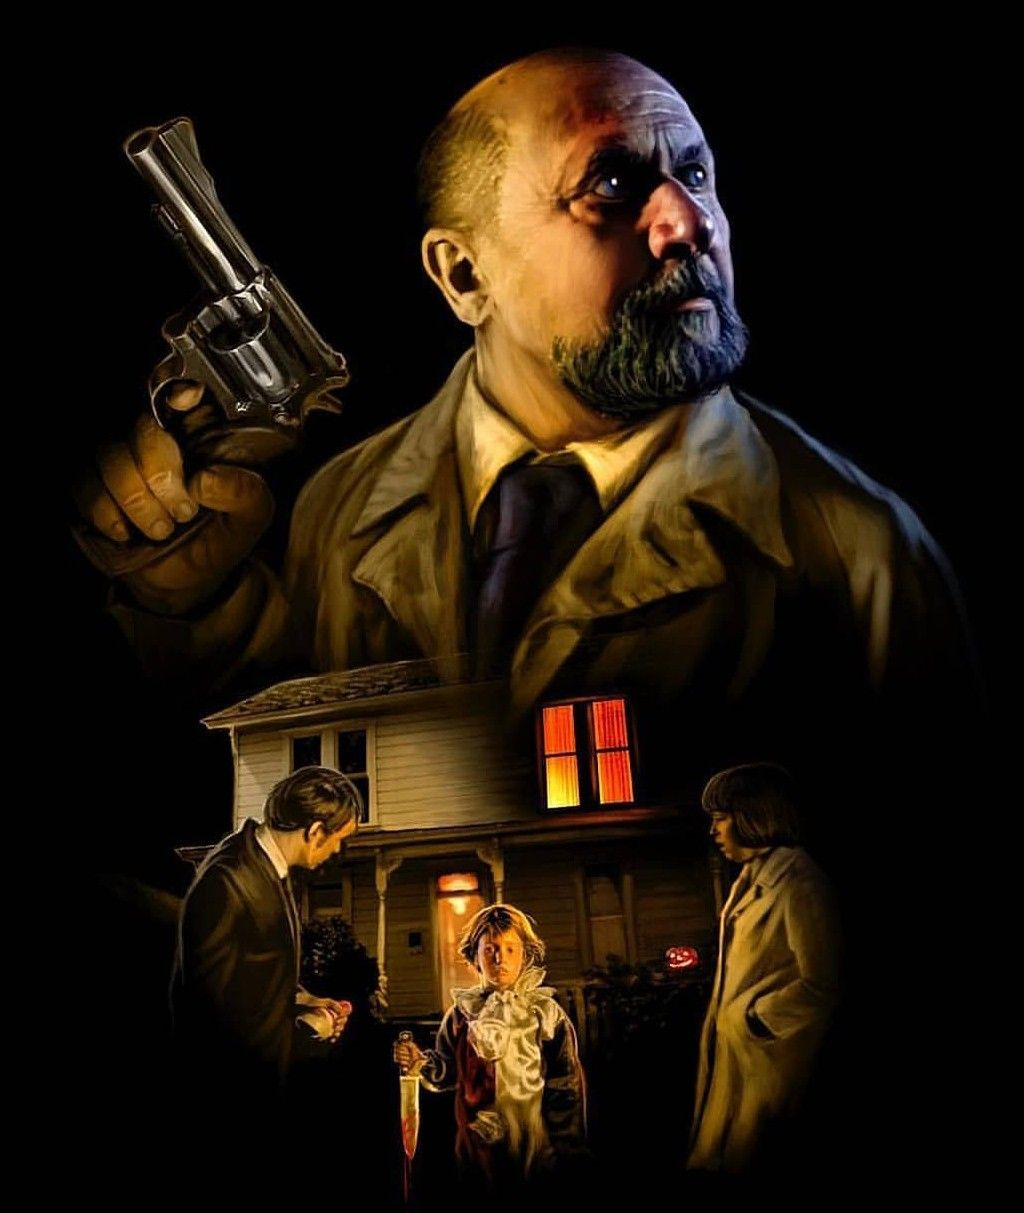 Halloween Dr. Loomis Michael Meyers Horror movie icons